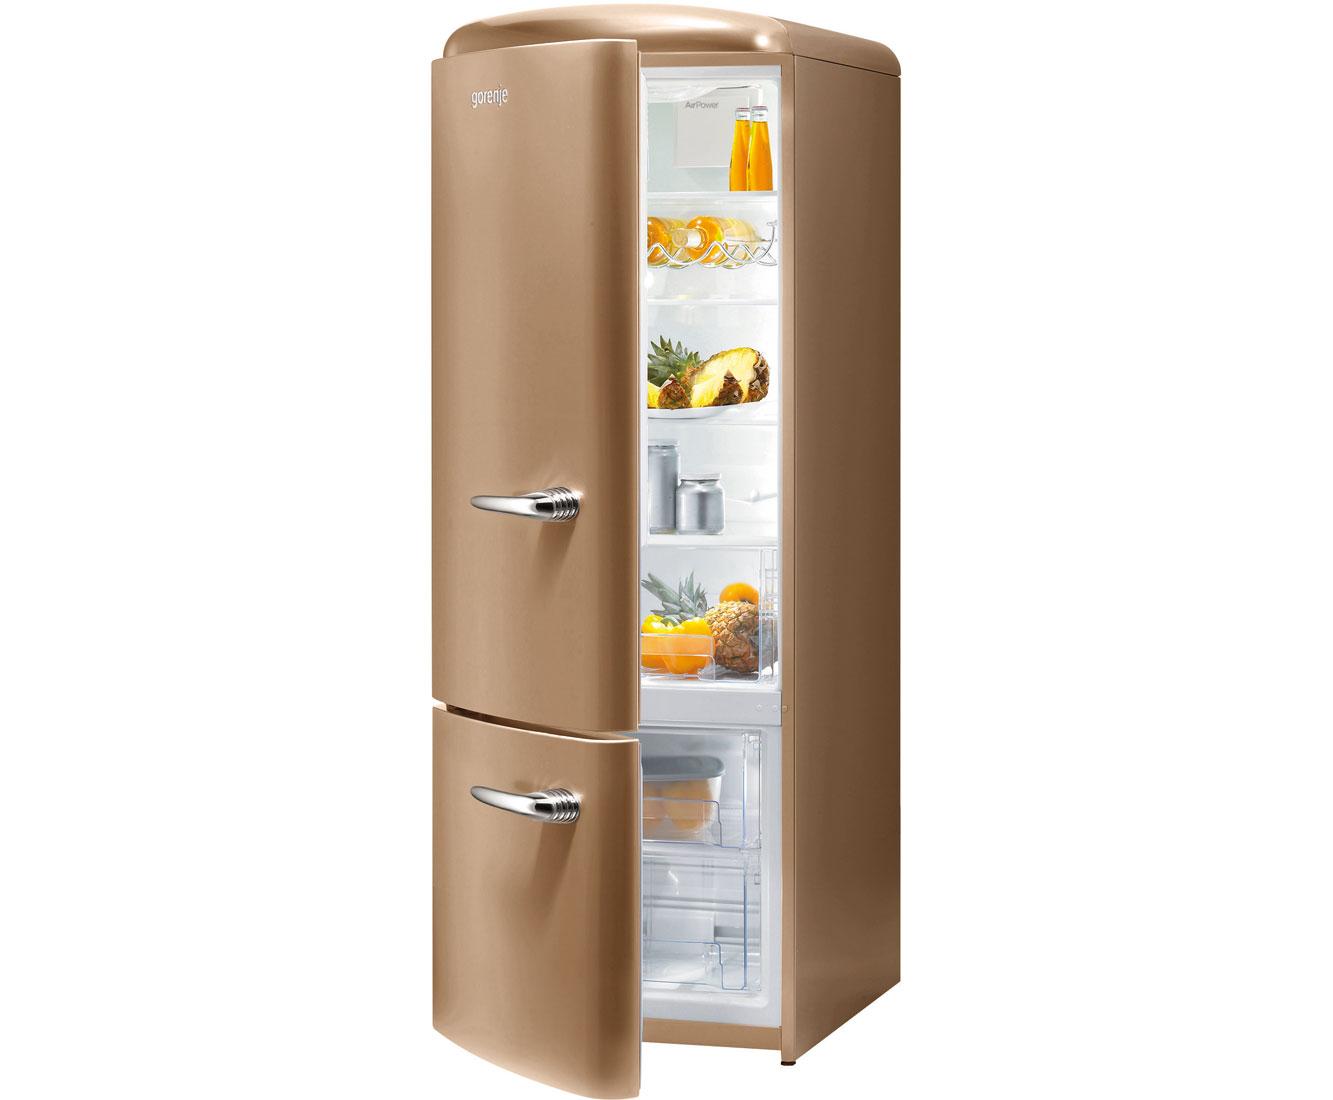 Gorenje Kühlschrank Innen Warm : Gorenje kühlschrank rückwand warm kühlschrank richtig einräumen